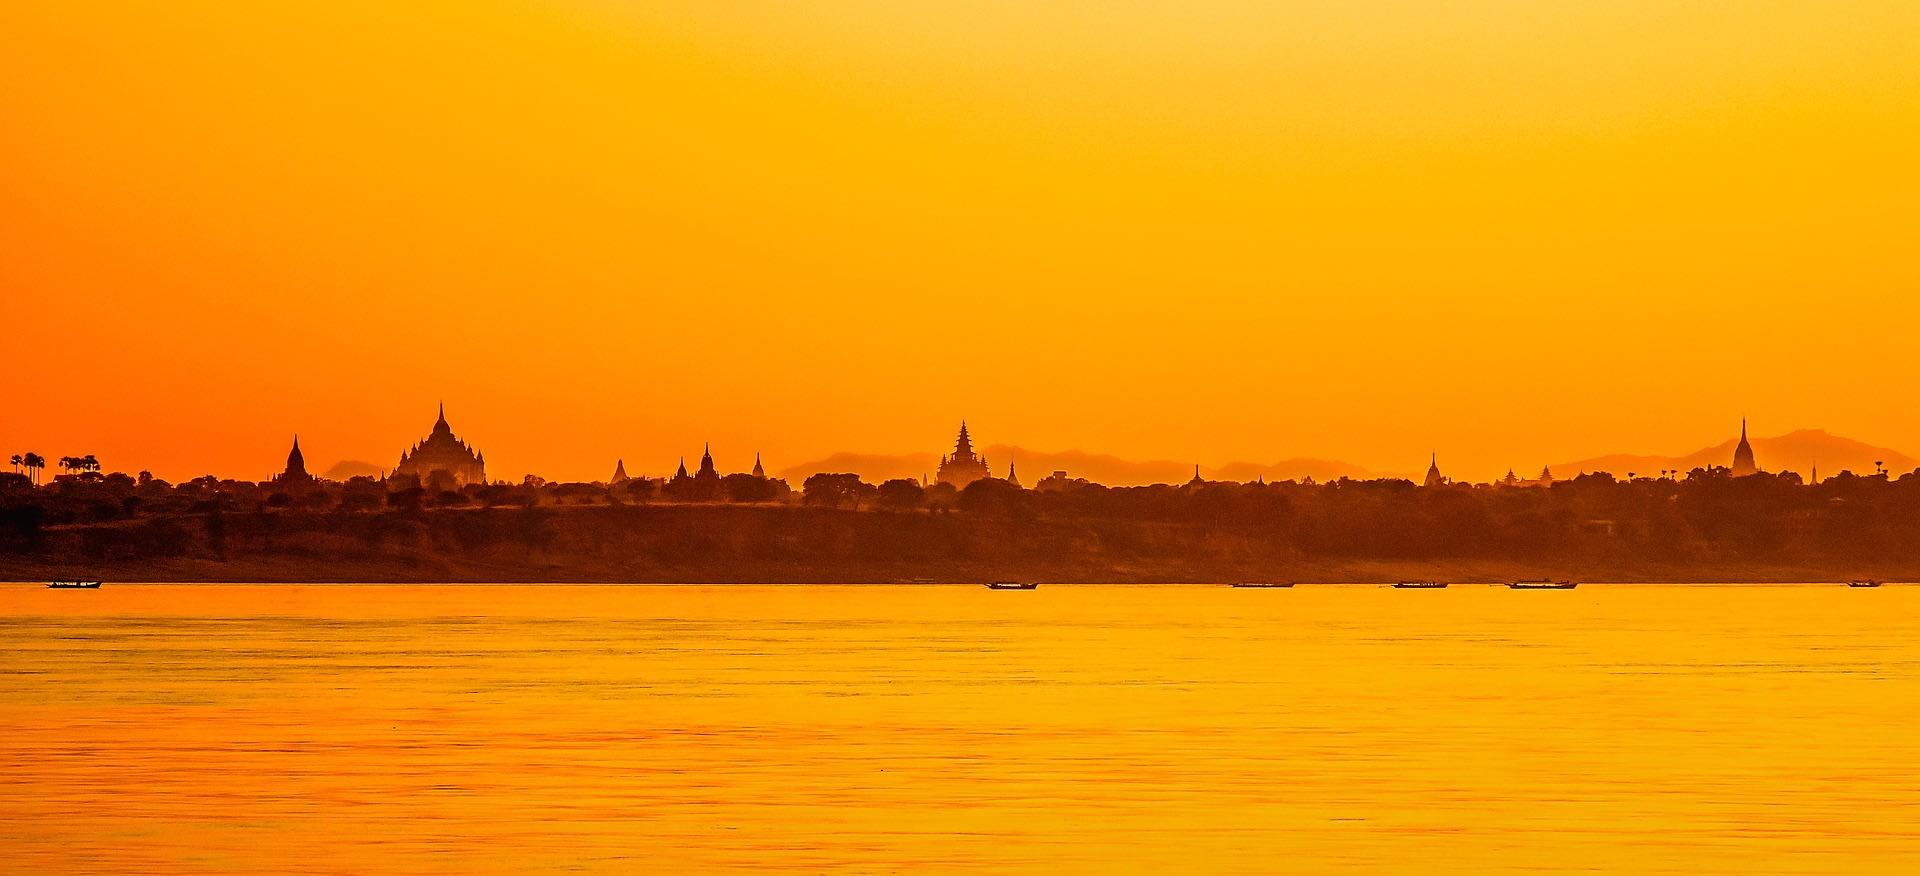 Shwezigone Pagoda Sunset View